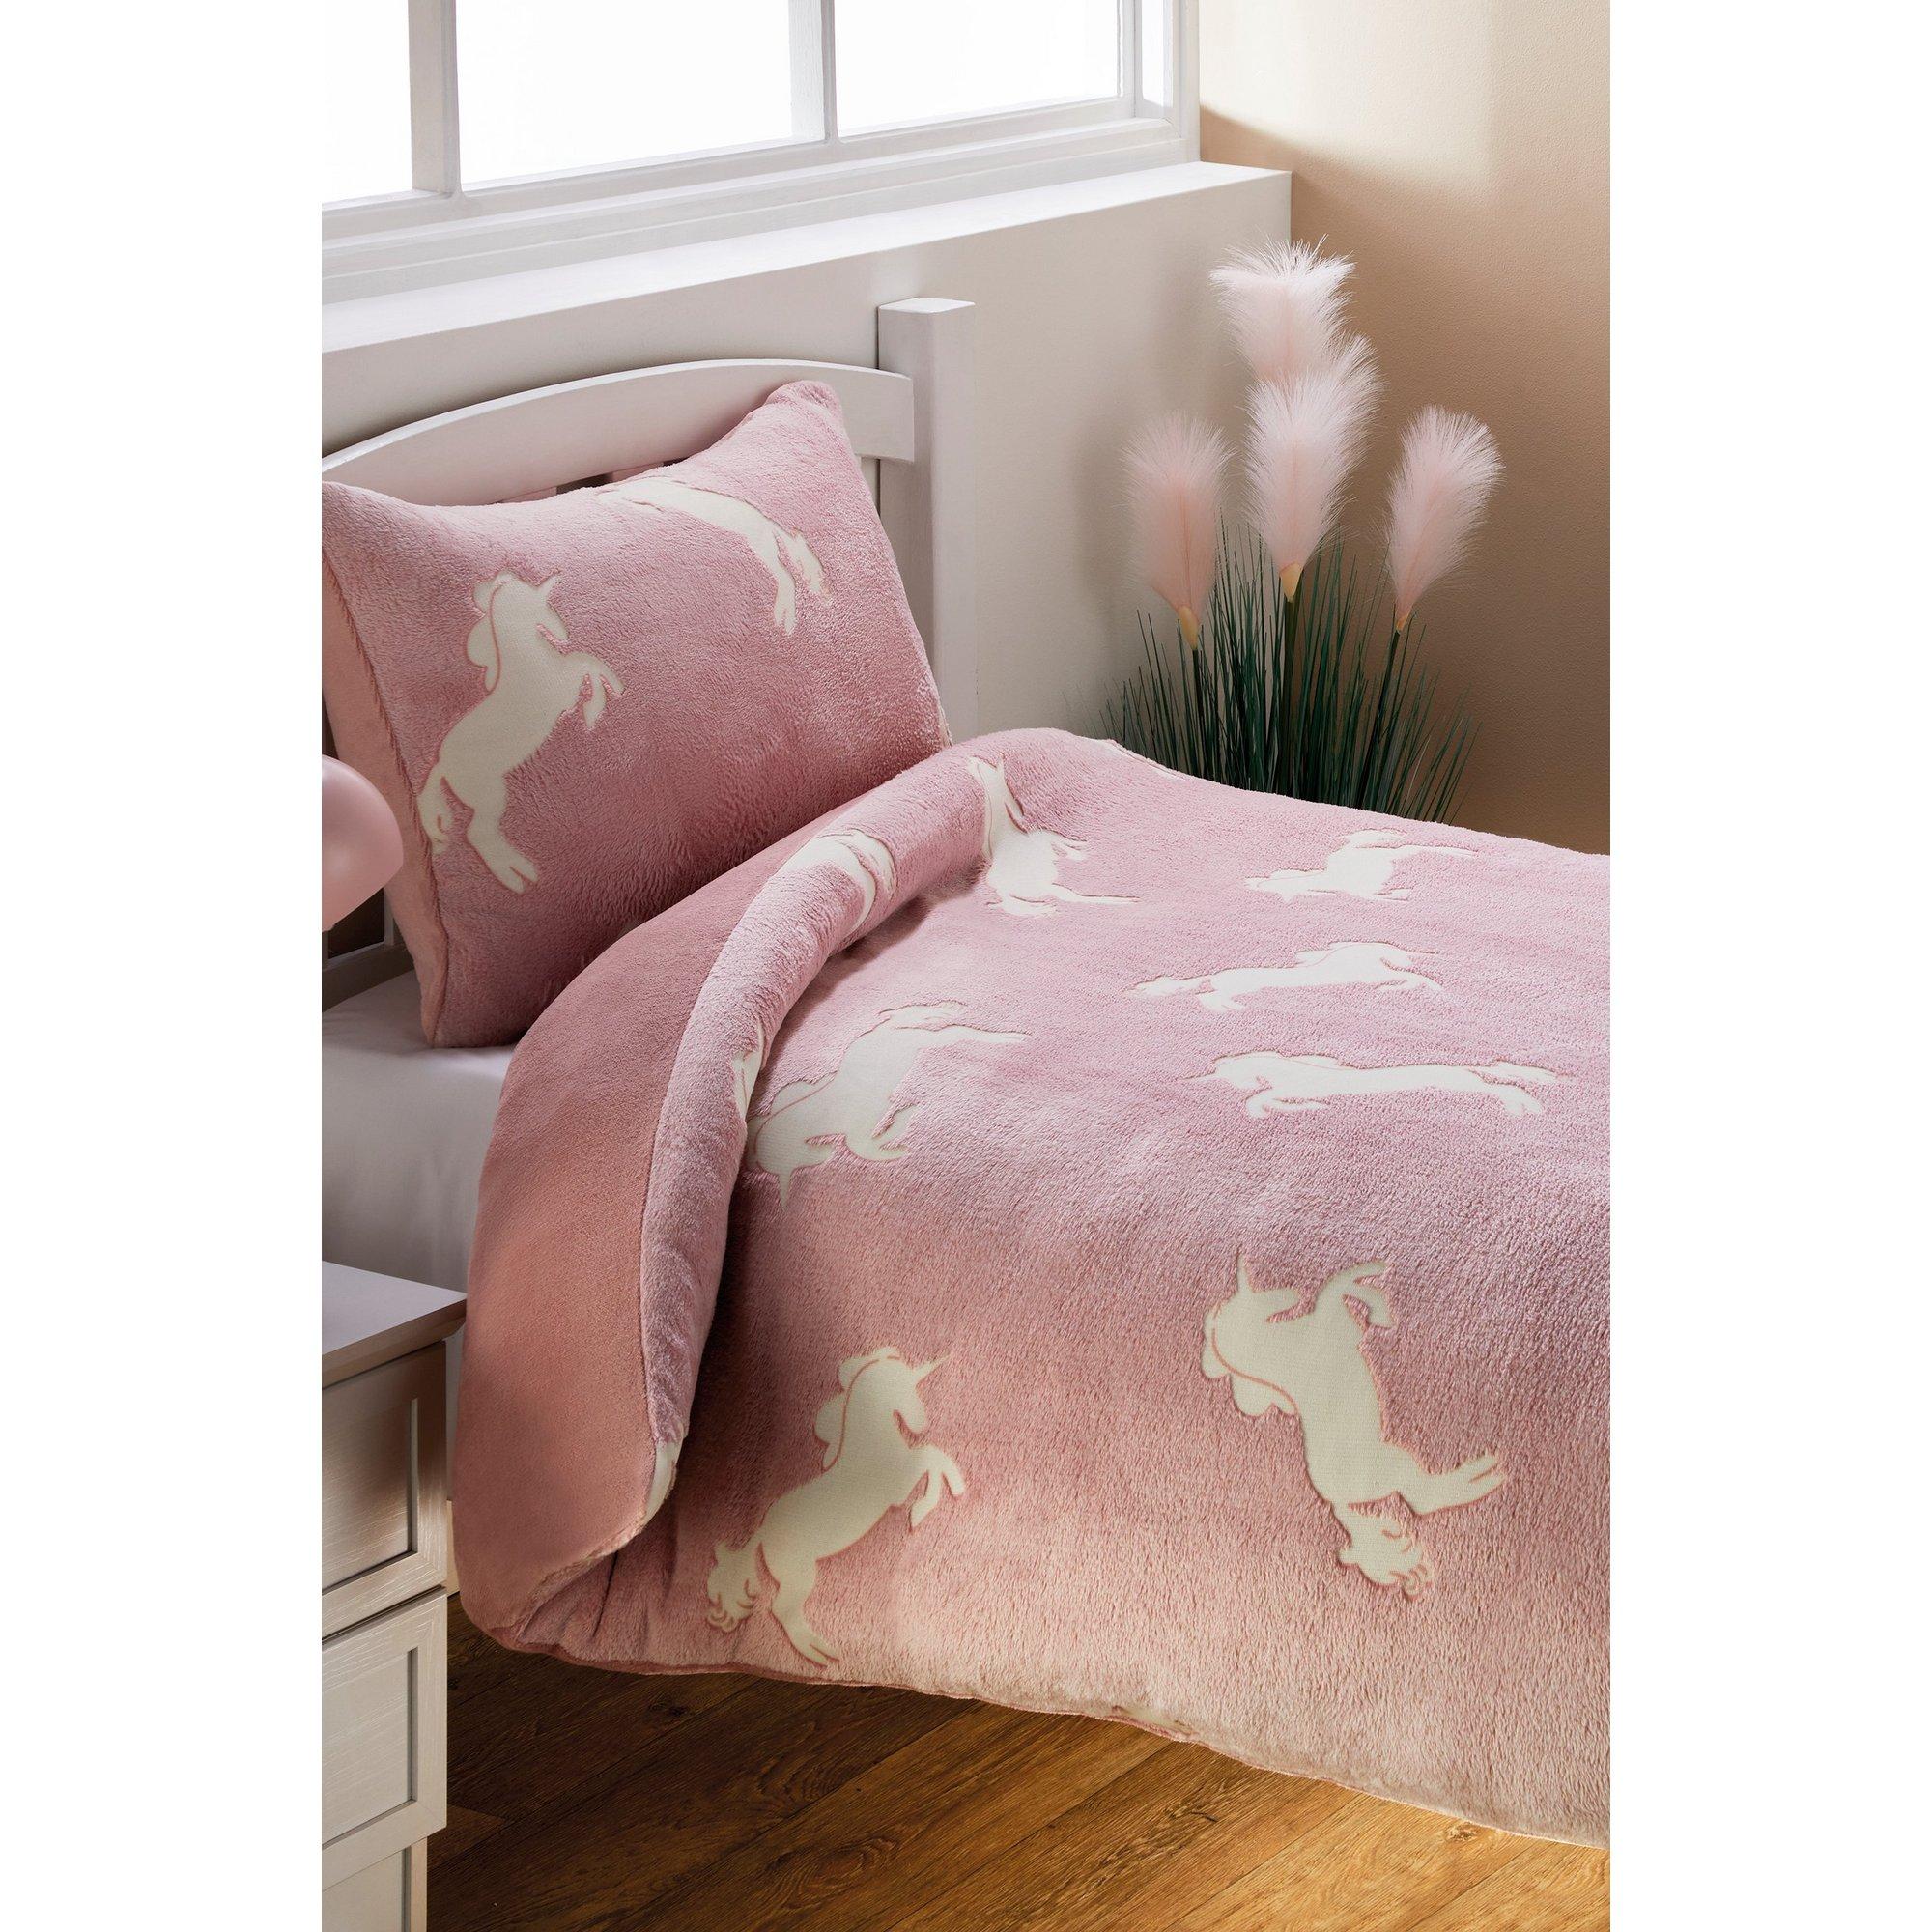 Image of Cuddle Teddy Glow In The Dark Unicorn Duvet Set